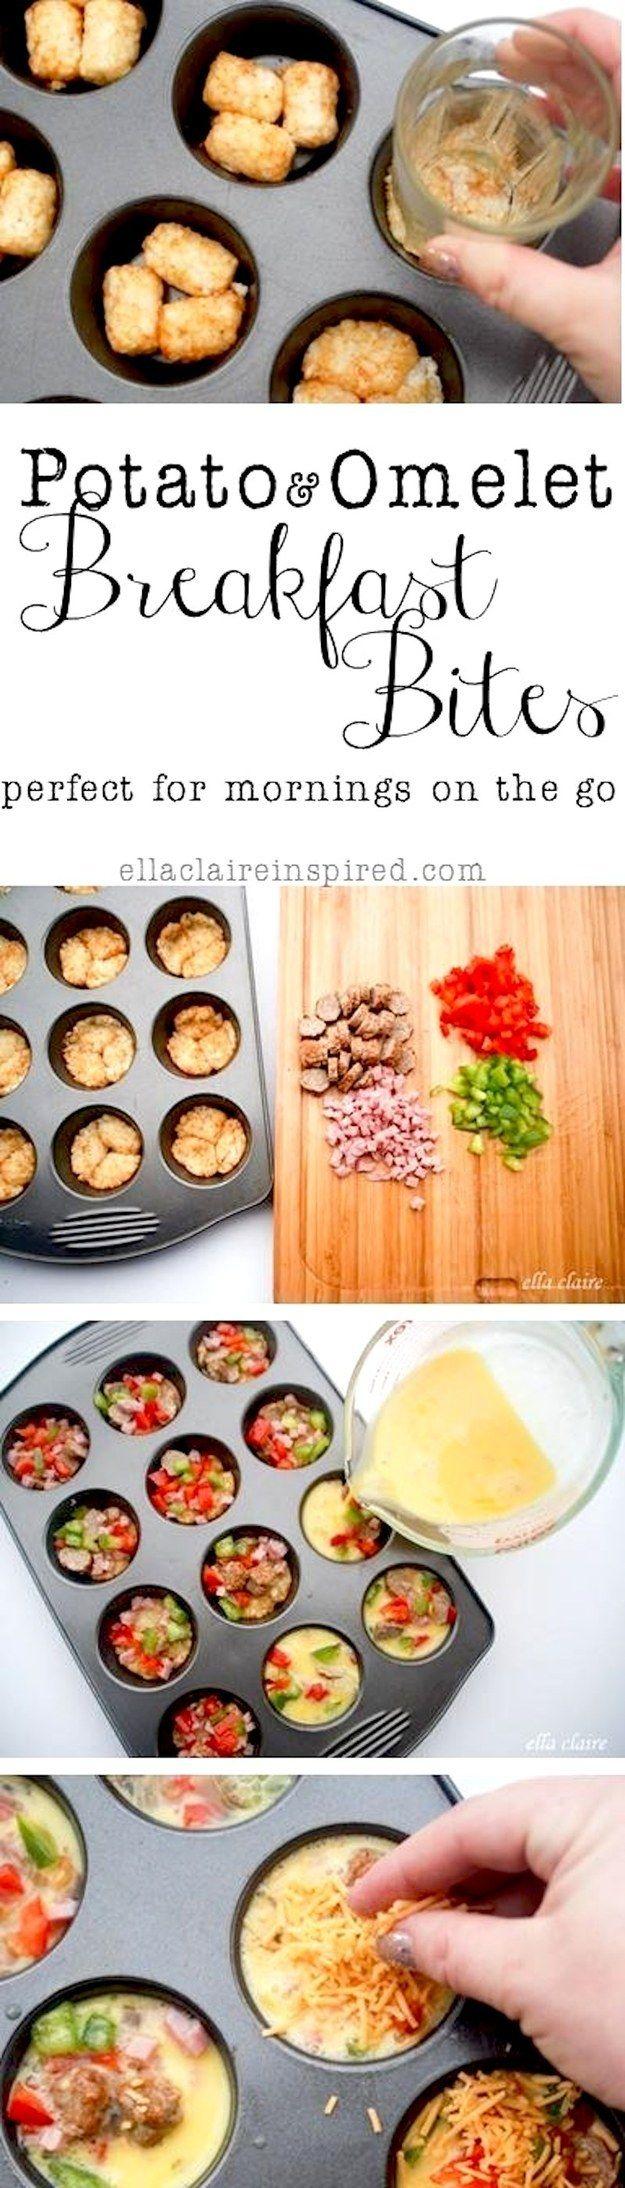 Potato & Omelet Breakfast Bites   21 Back-To-School Breakfast Recipes That Kids Will Love